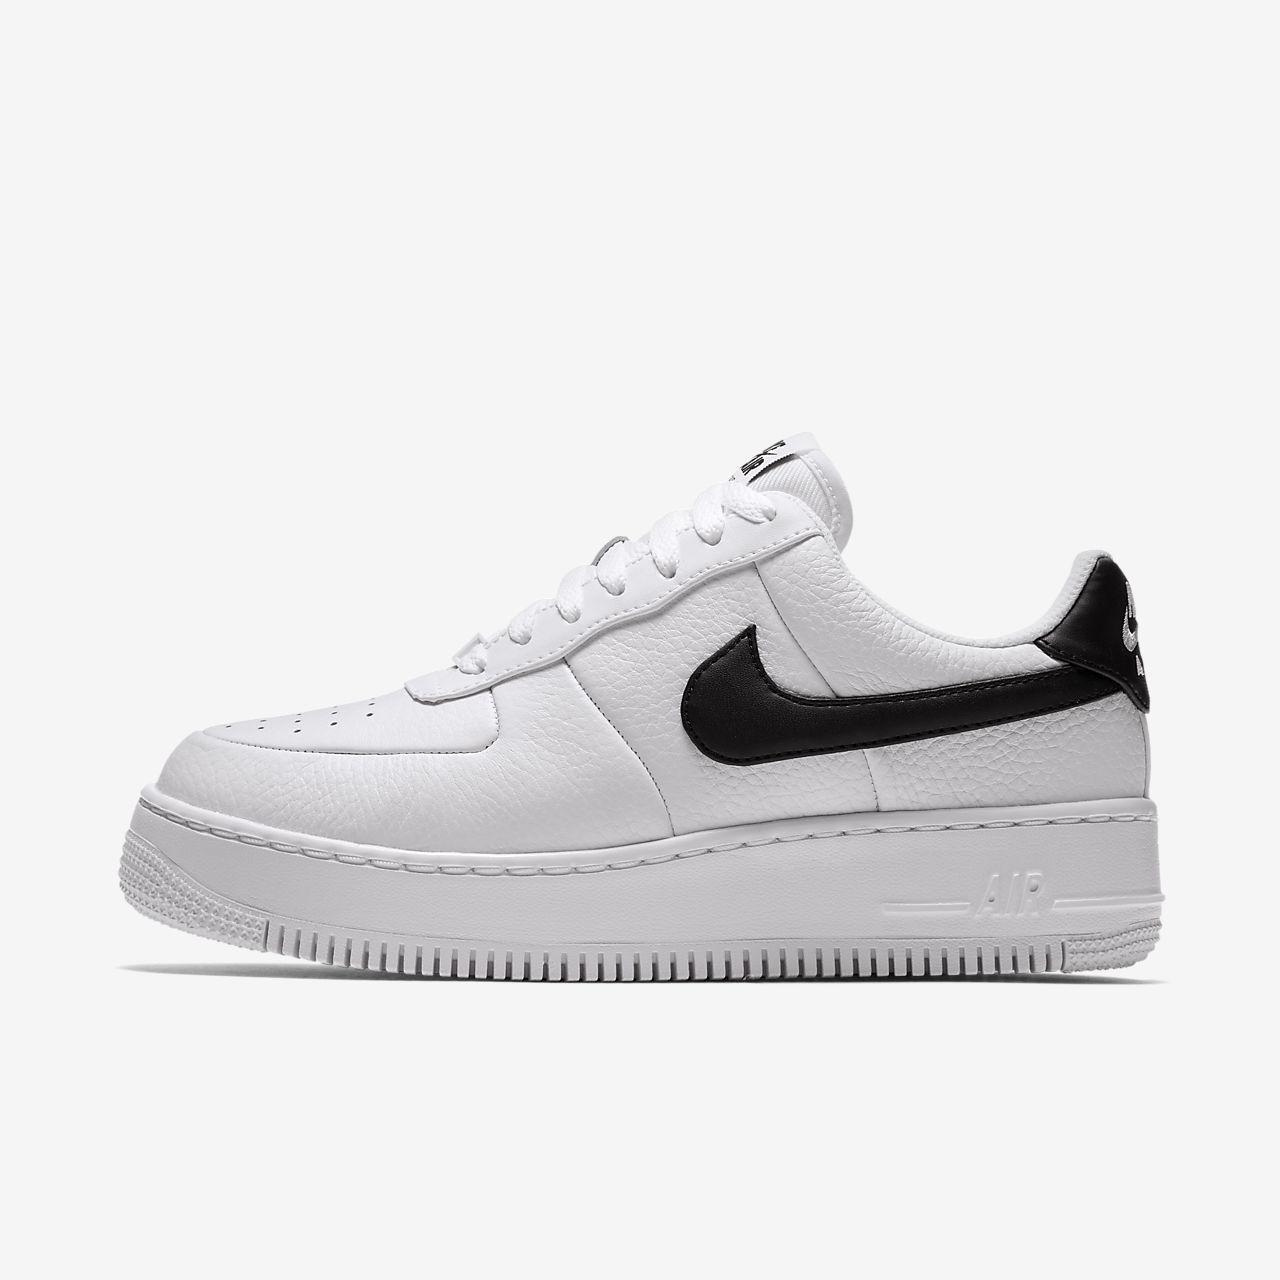 1 Ca Upstep Pour Zppfn4wz Air Chaussure Femme Nike Force FK3l1JcT